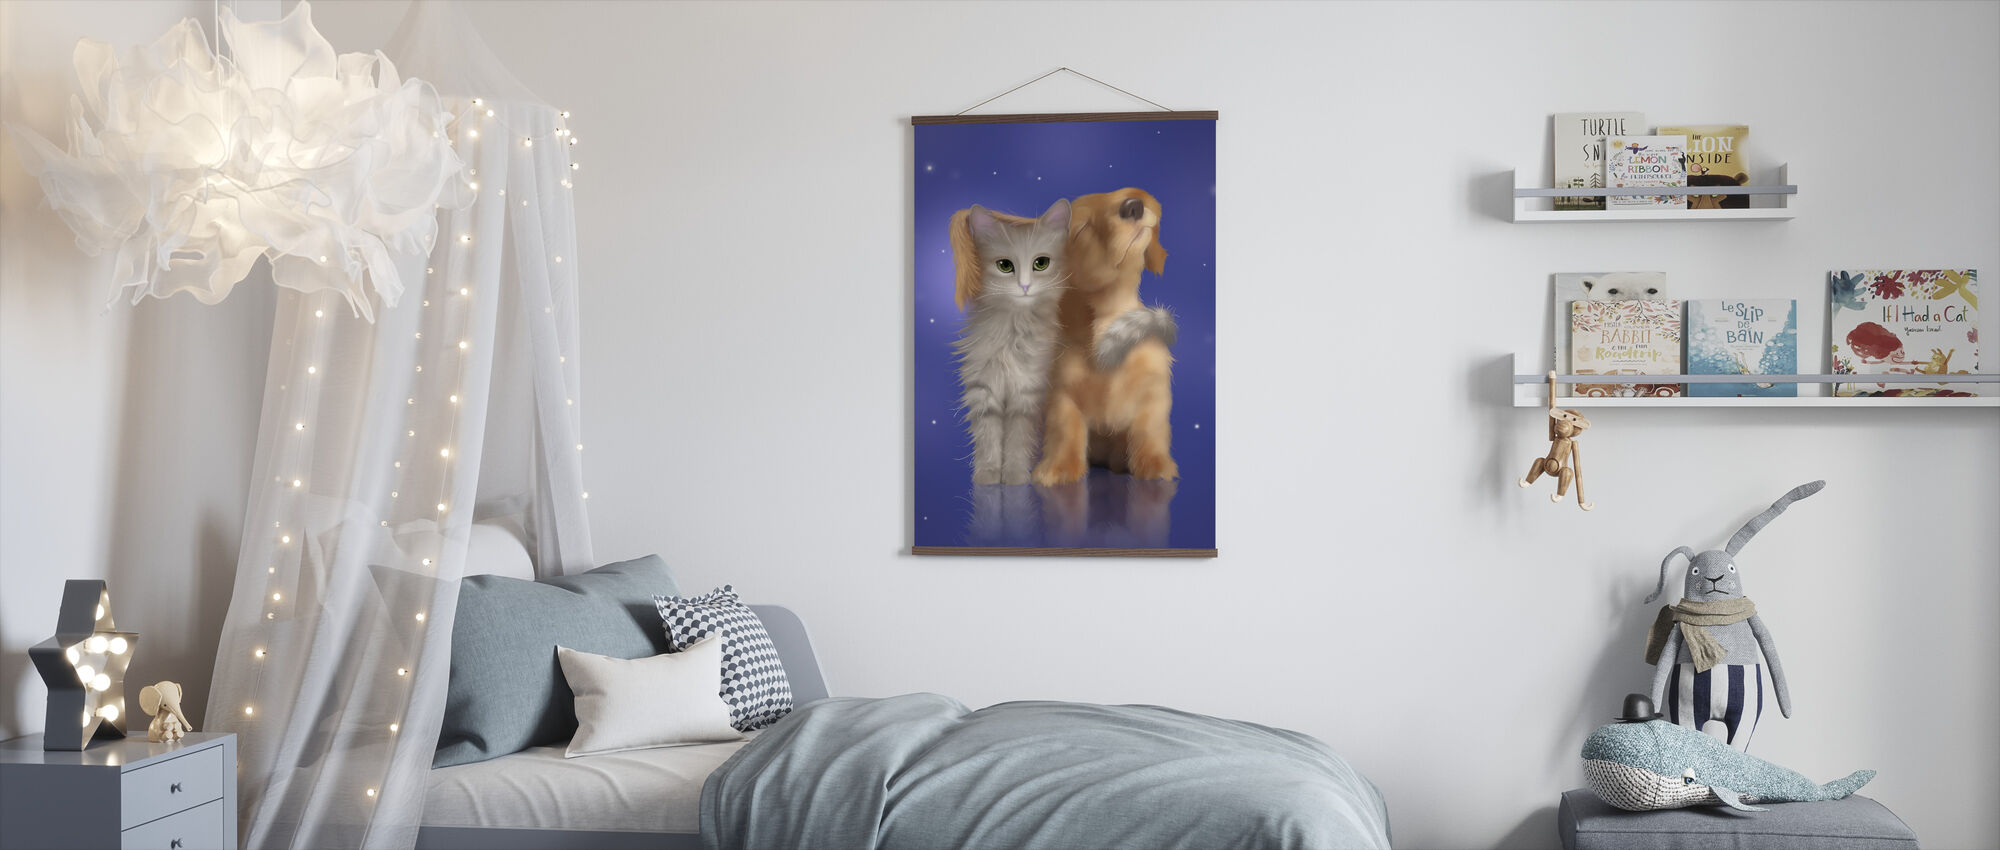 Puppy Liefde - Poster - Kinderkamer